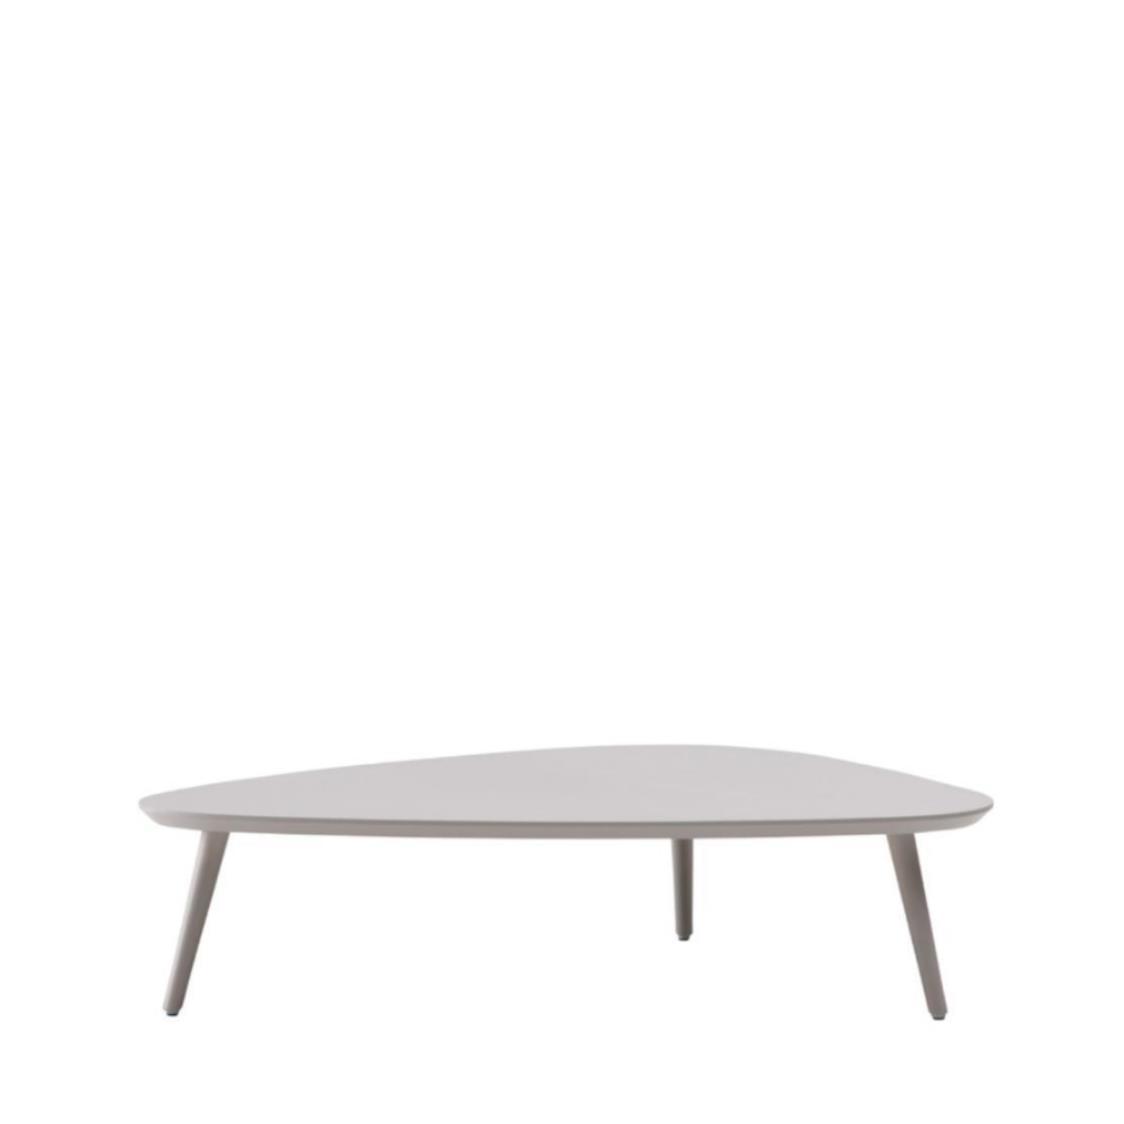 Iloom Mu 1200w Sofa Table GYM Low legs